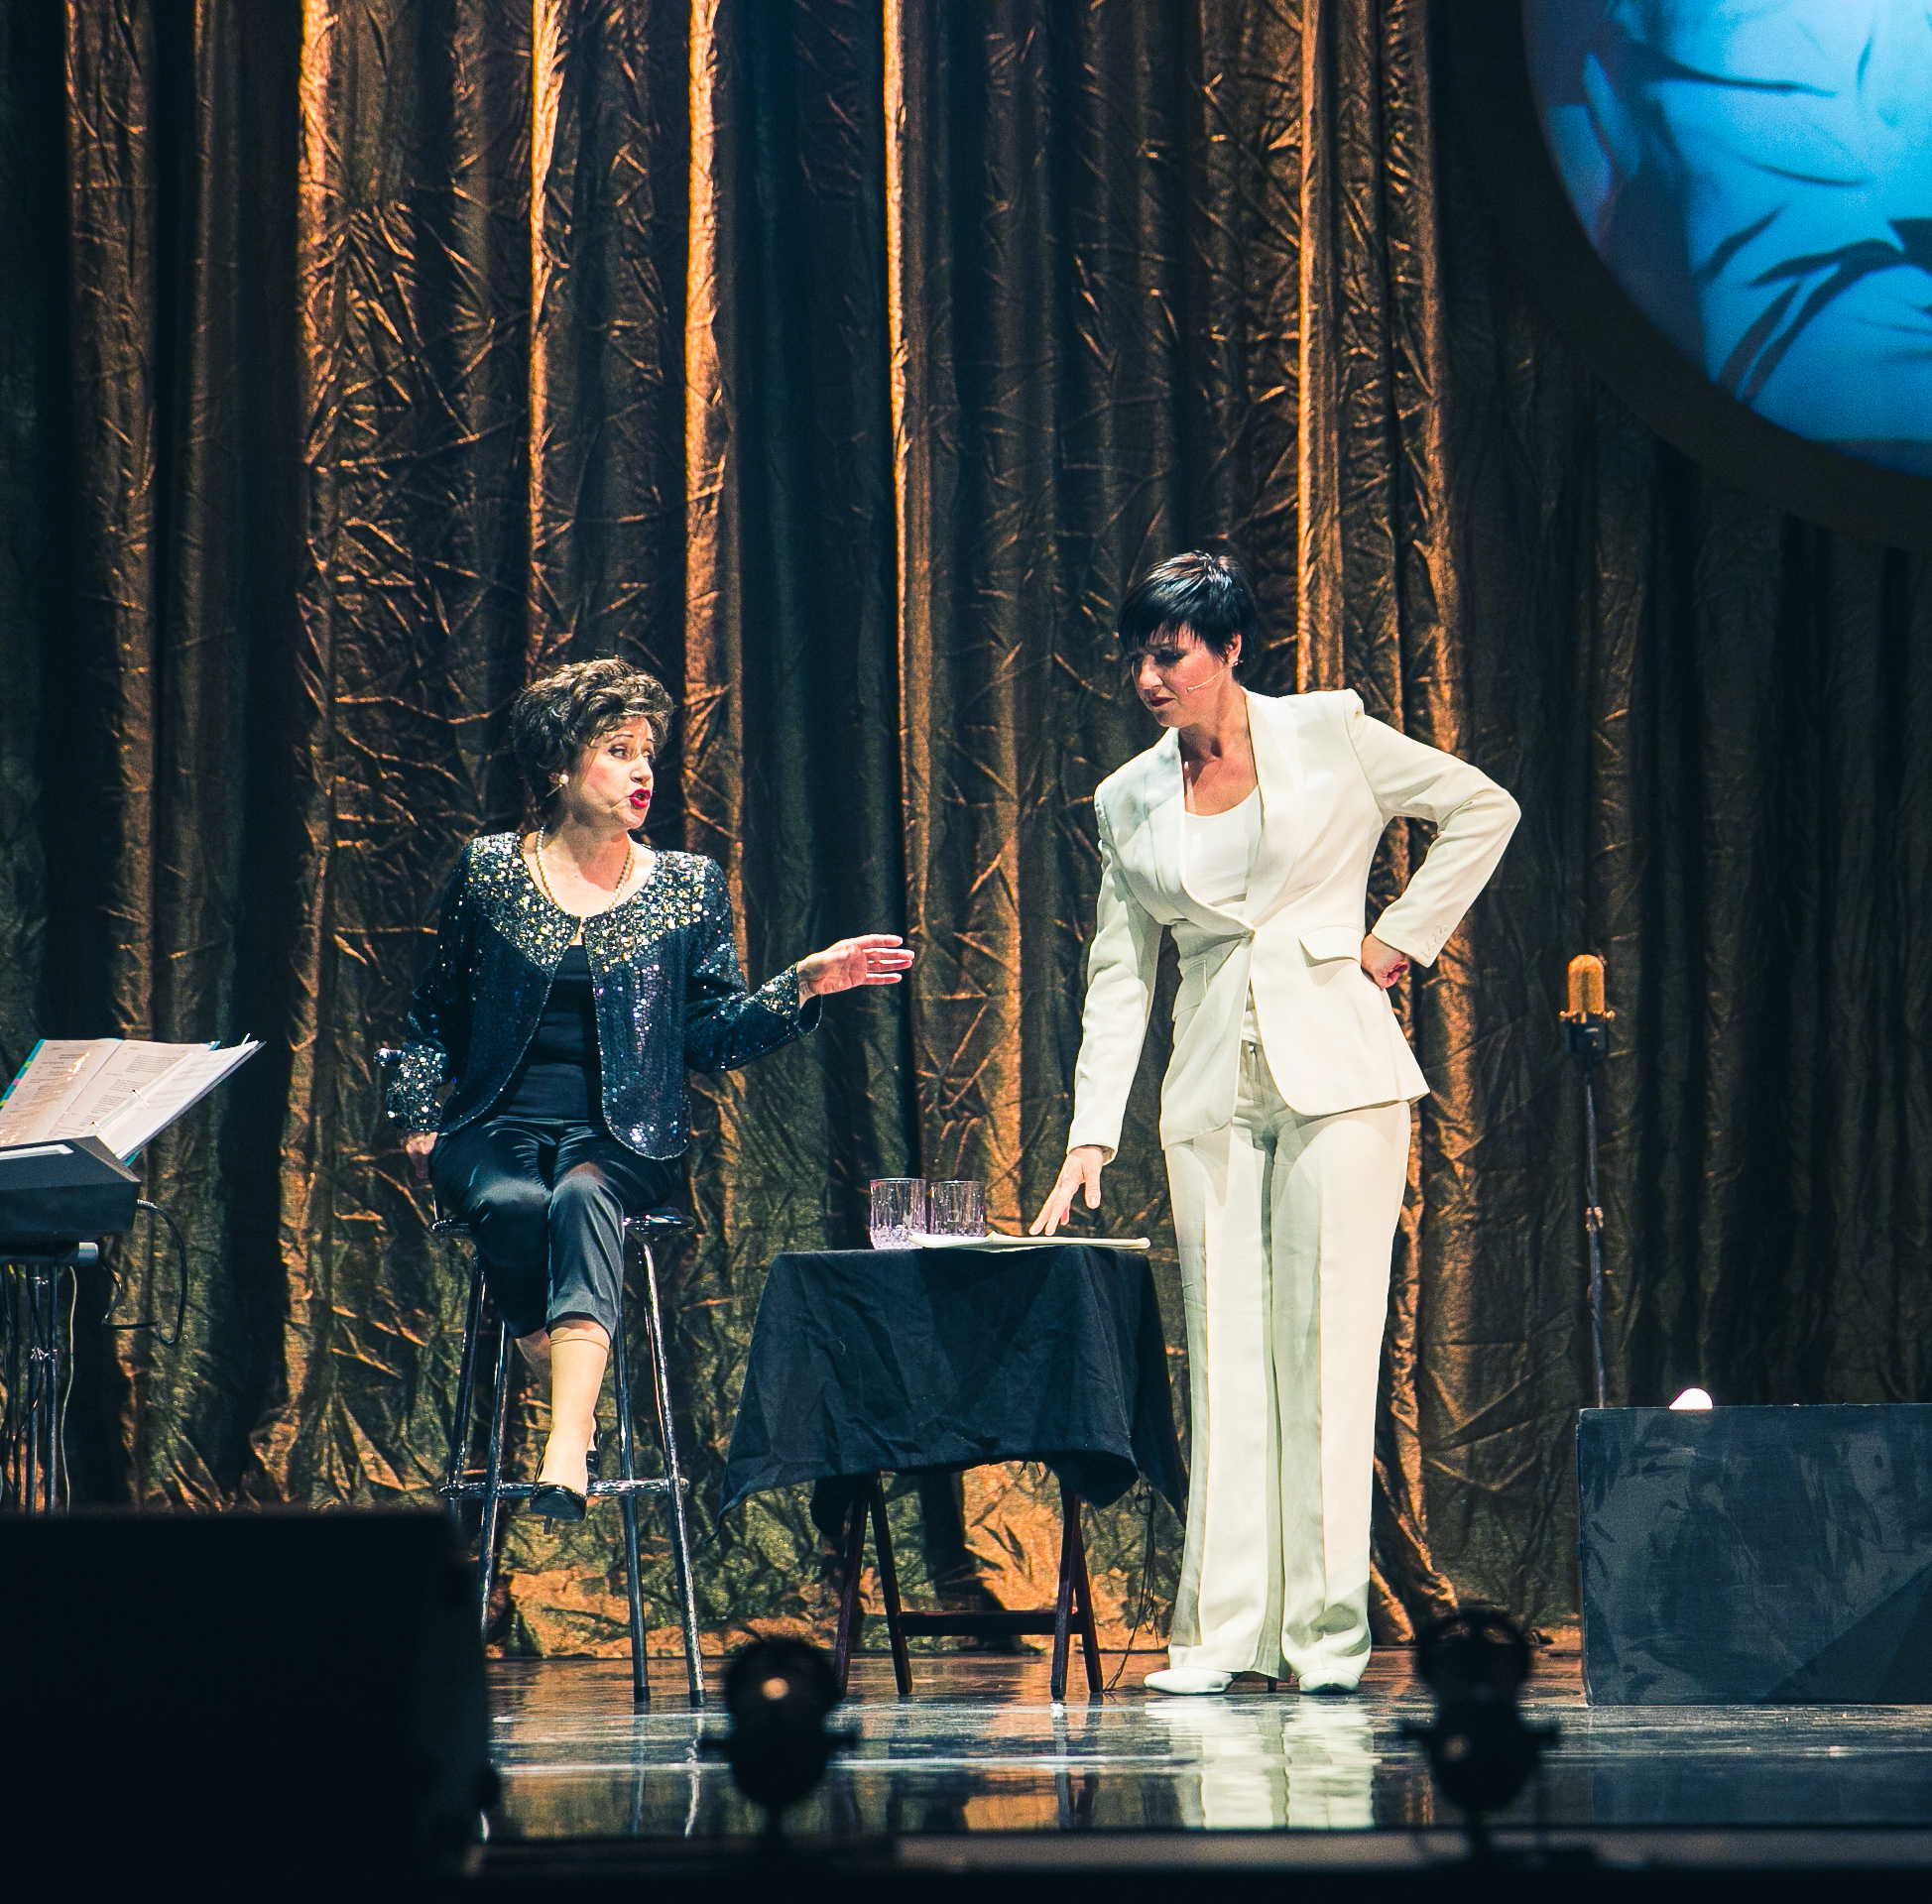 Judy & Liza - The Amazing Bio-Musical